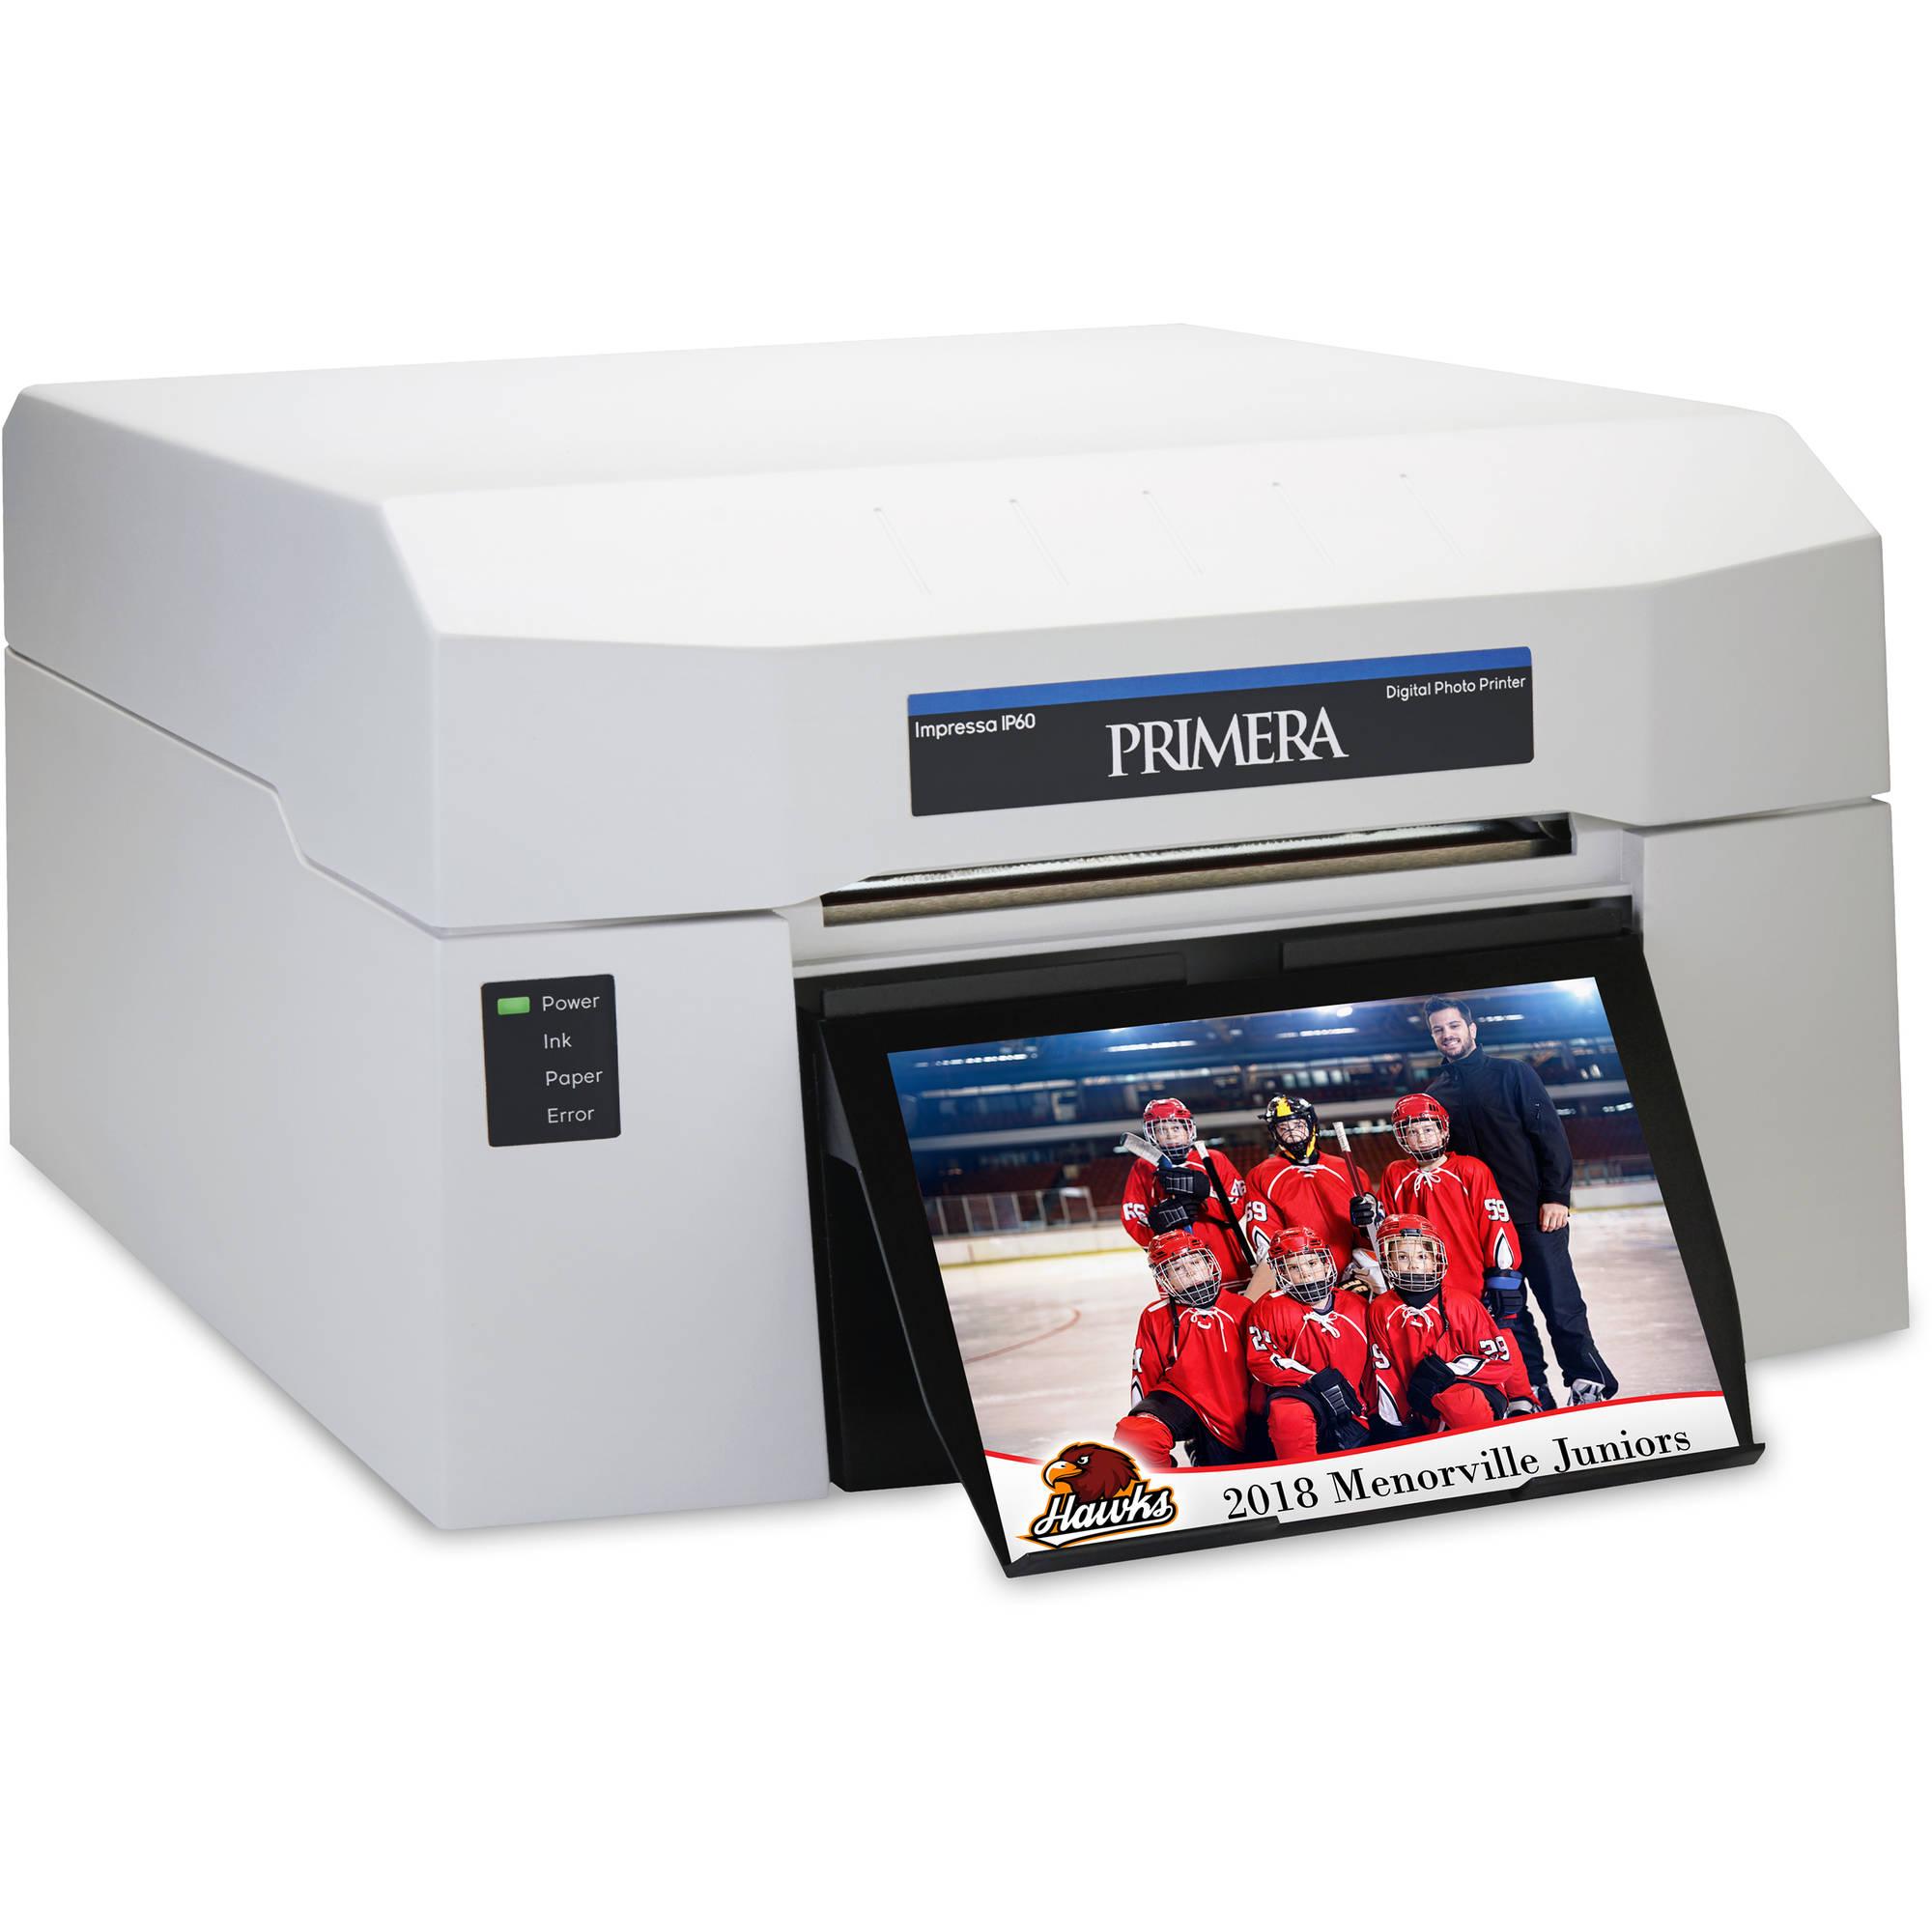 Primera Impressa IP60 Photo Printer